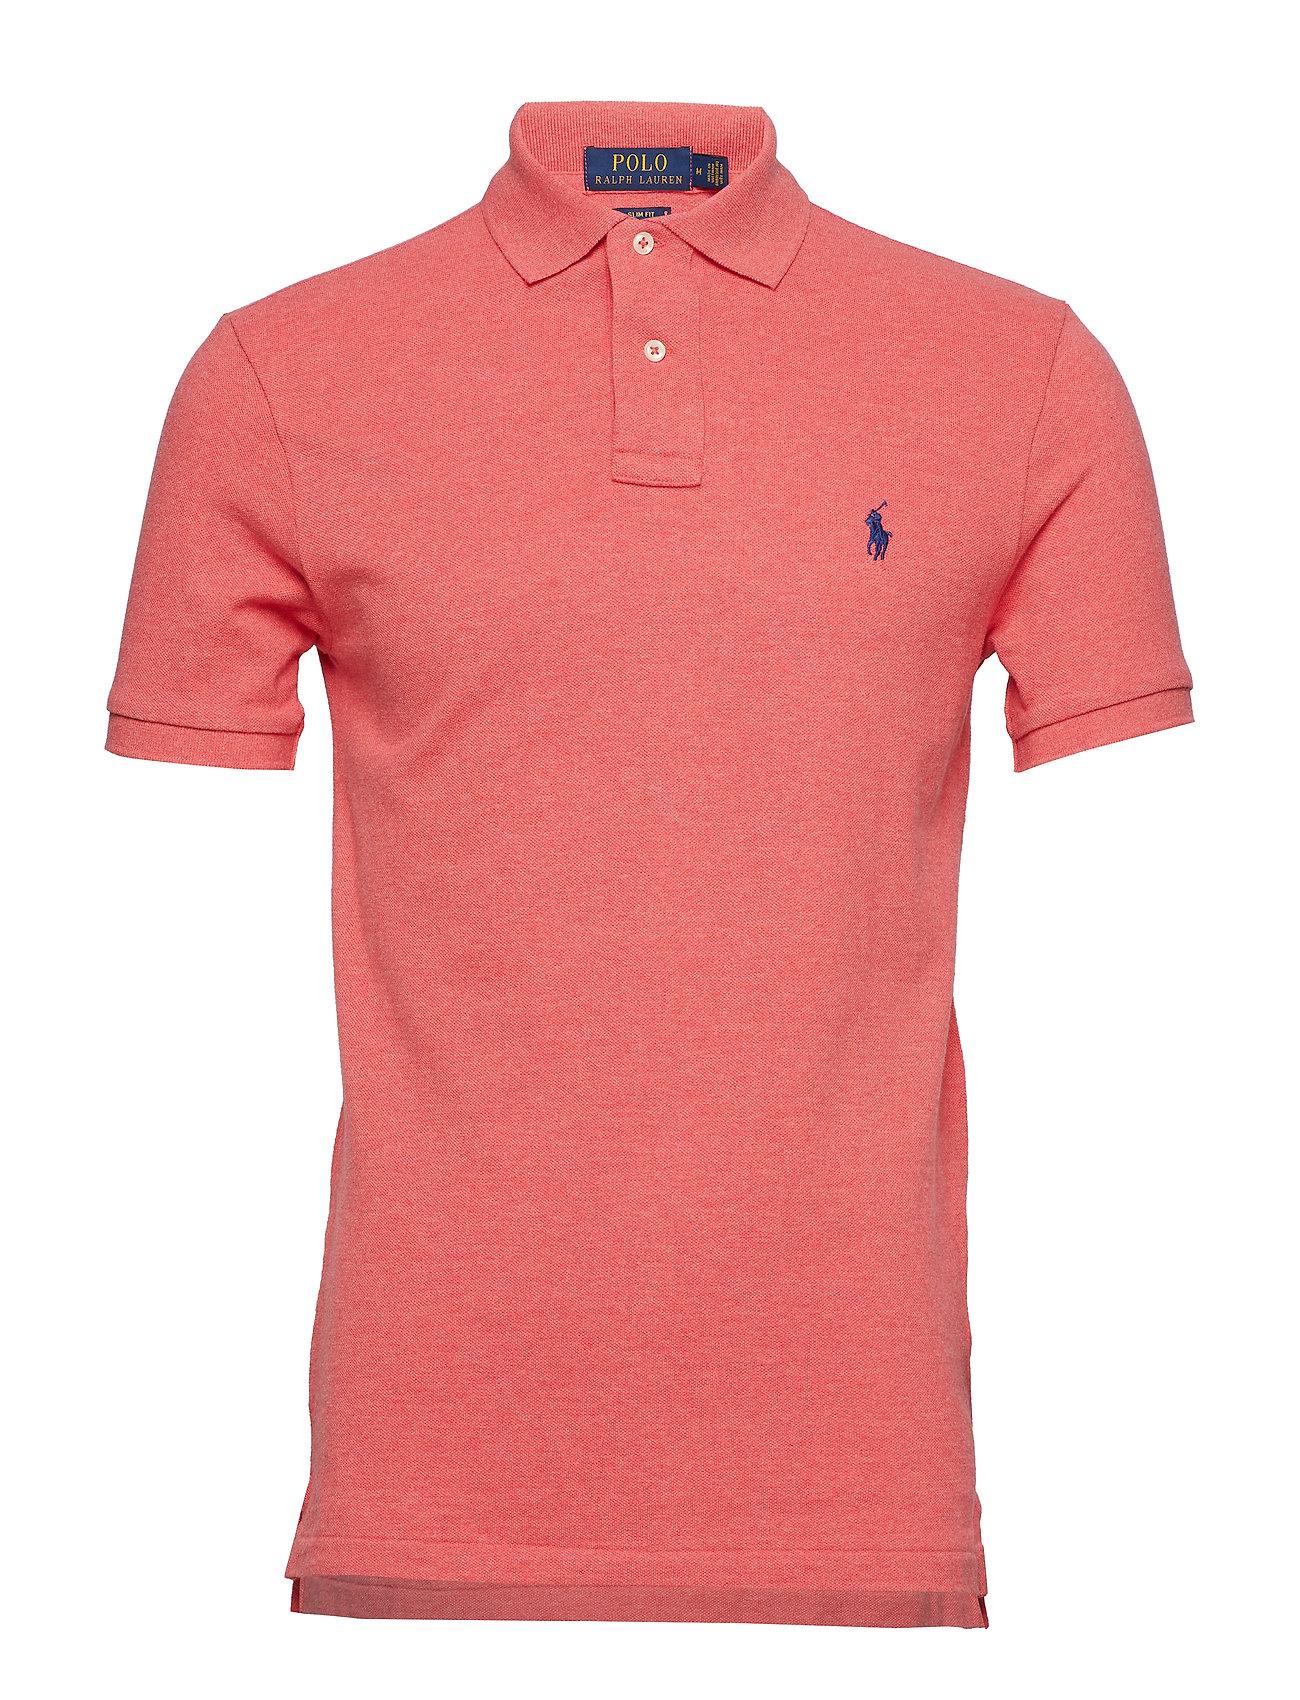 Polo Ralph Lauren Slim Fit Mesh Polo Shirt - HIGHLAND ROSE HEA